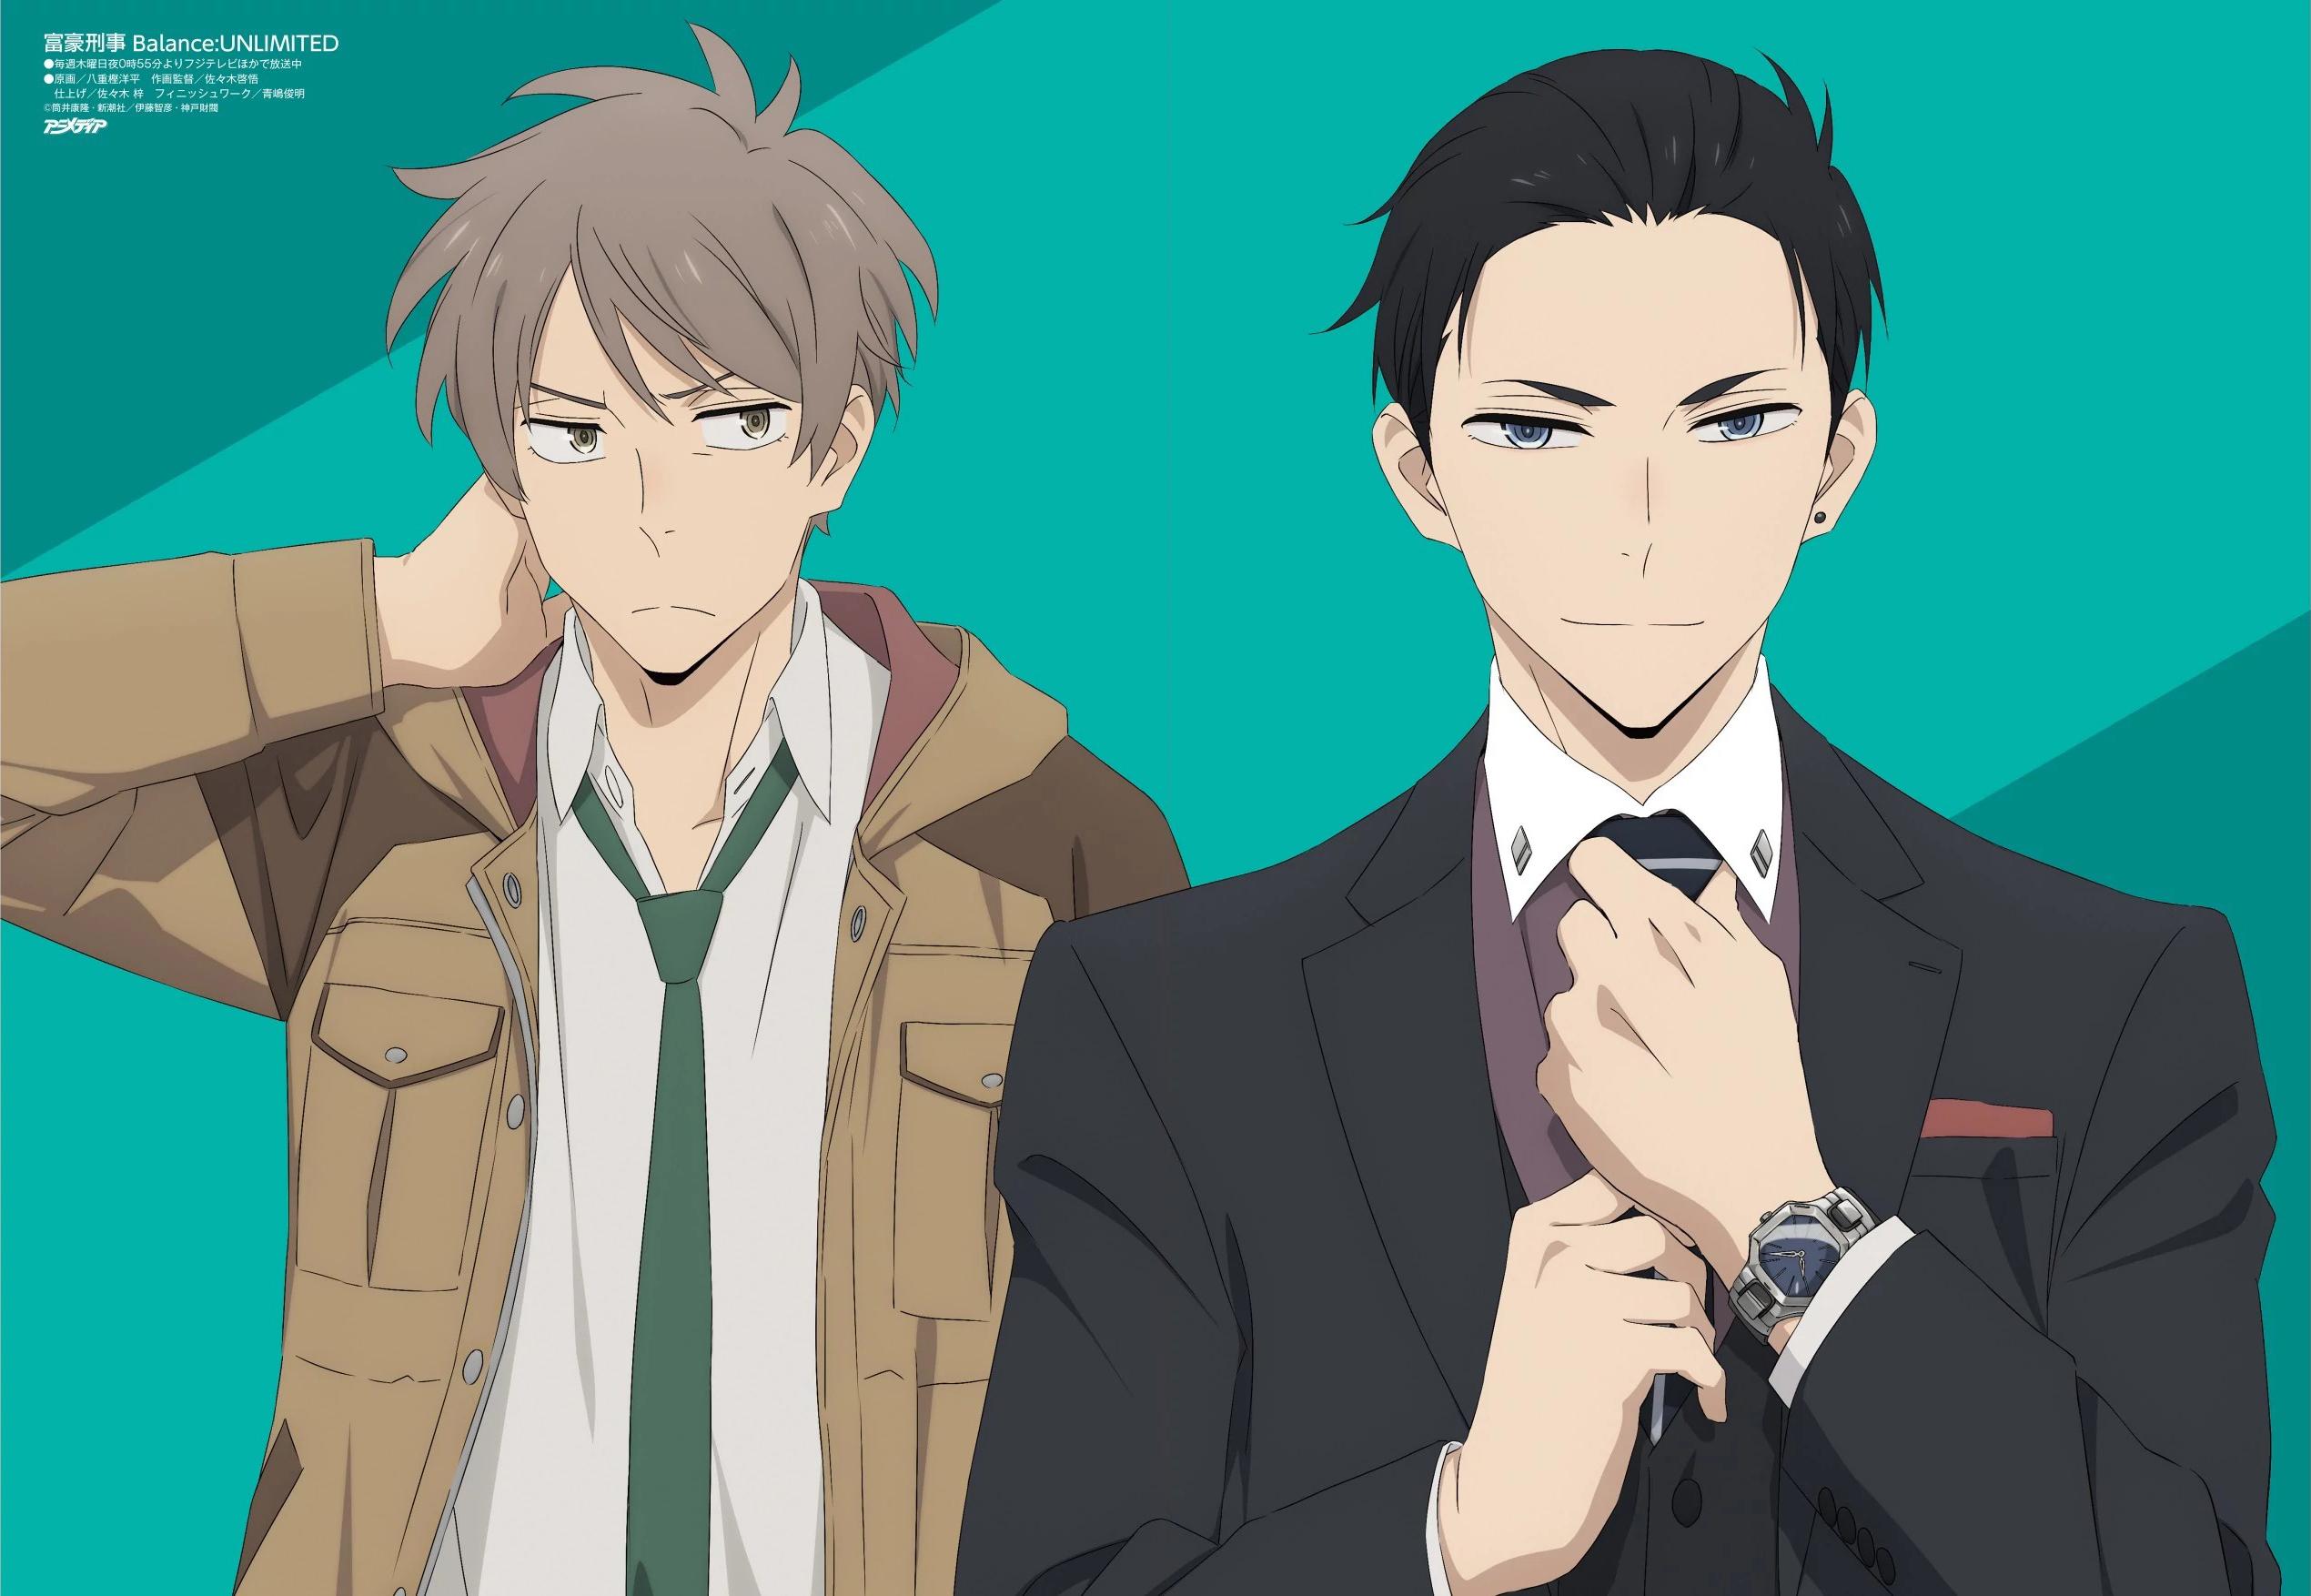 Fugou Keiji: Balance:UNLIMITED Image #3011093 - Zerochan Anime Image Board